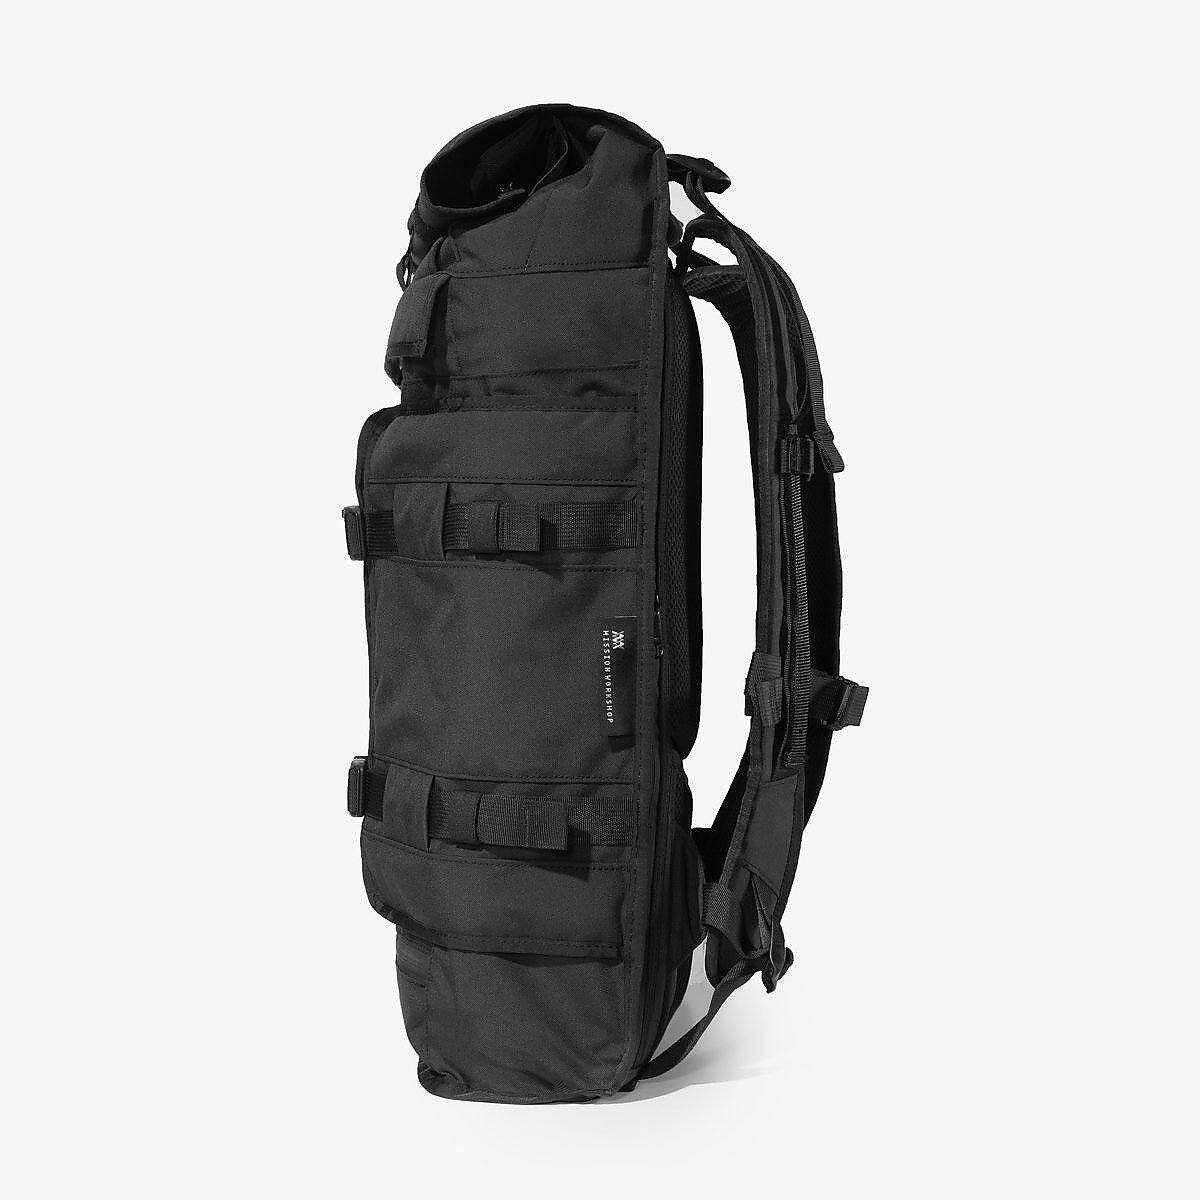 The Rhake 22L Laptop Backpack by Mission Workshop.